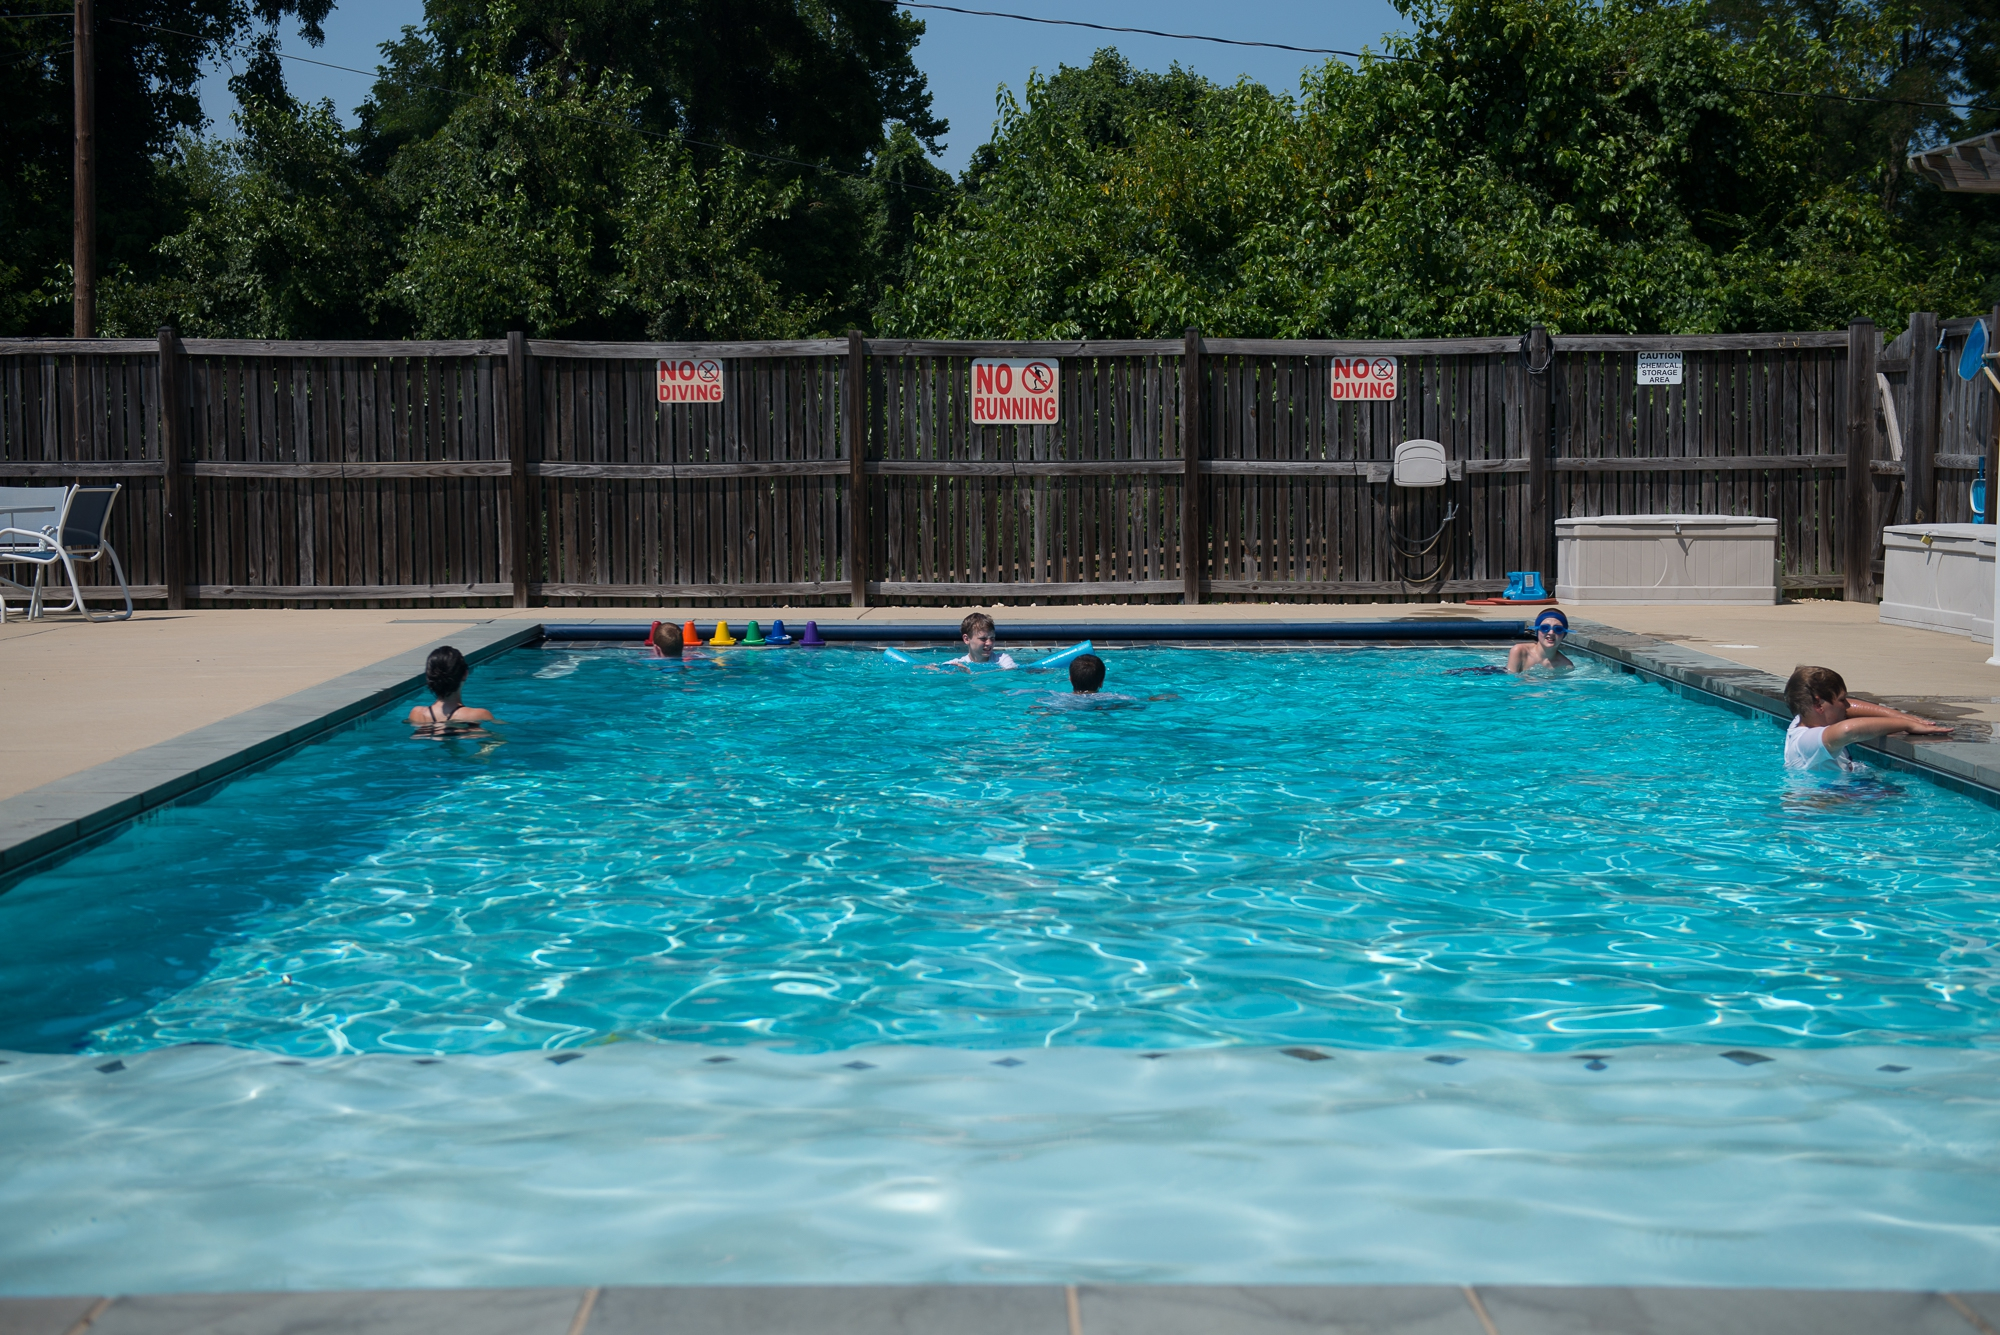 <p>The pool area</p>